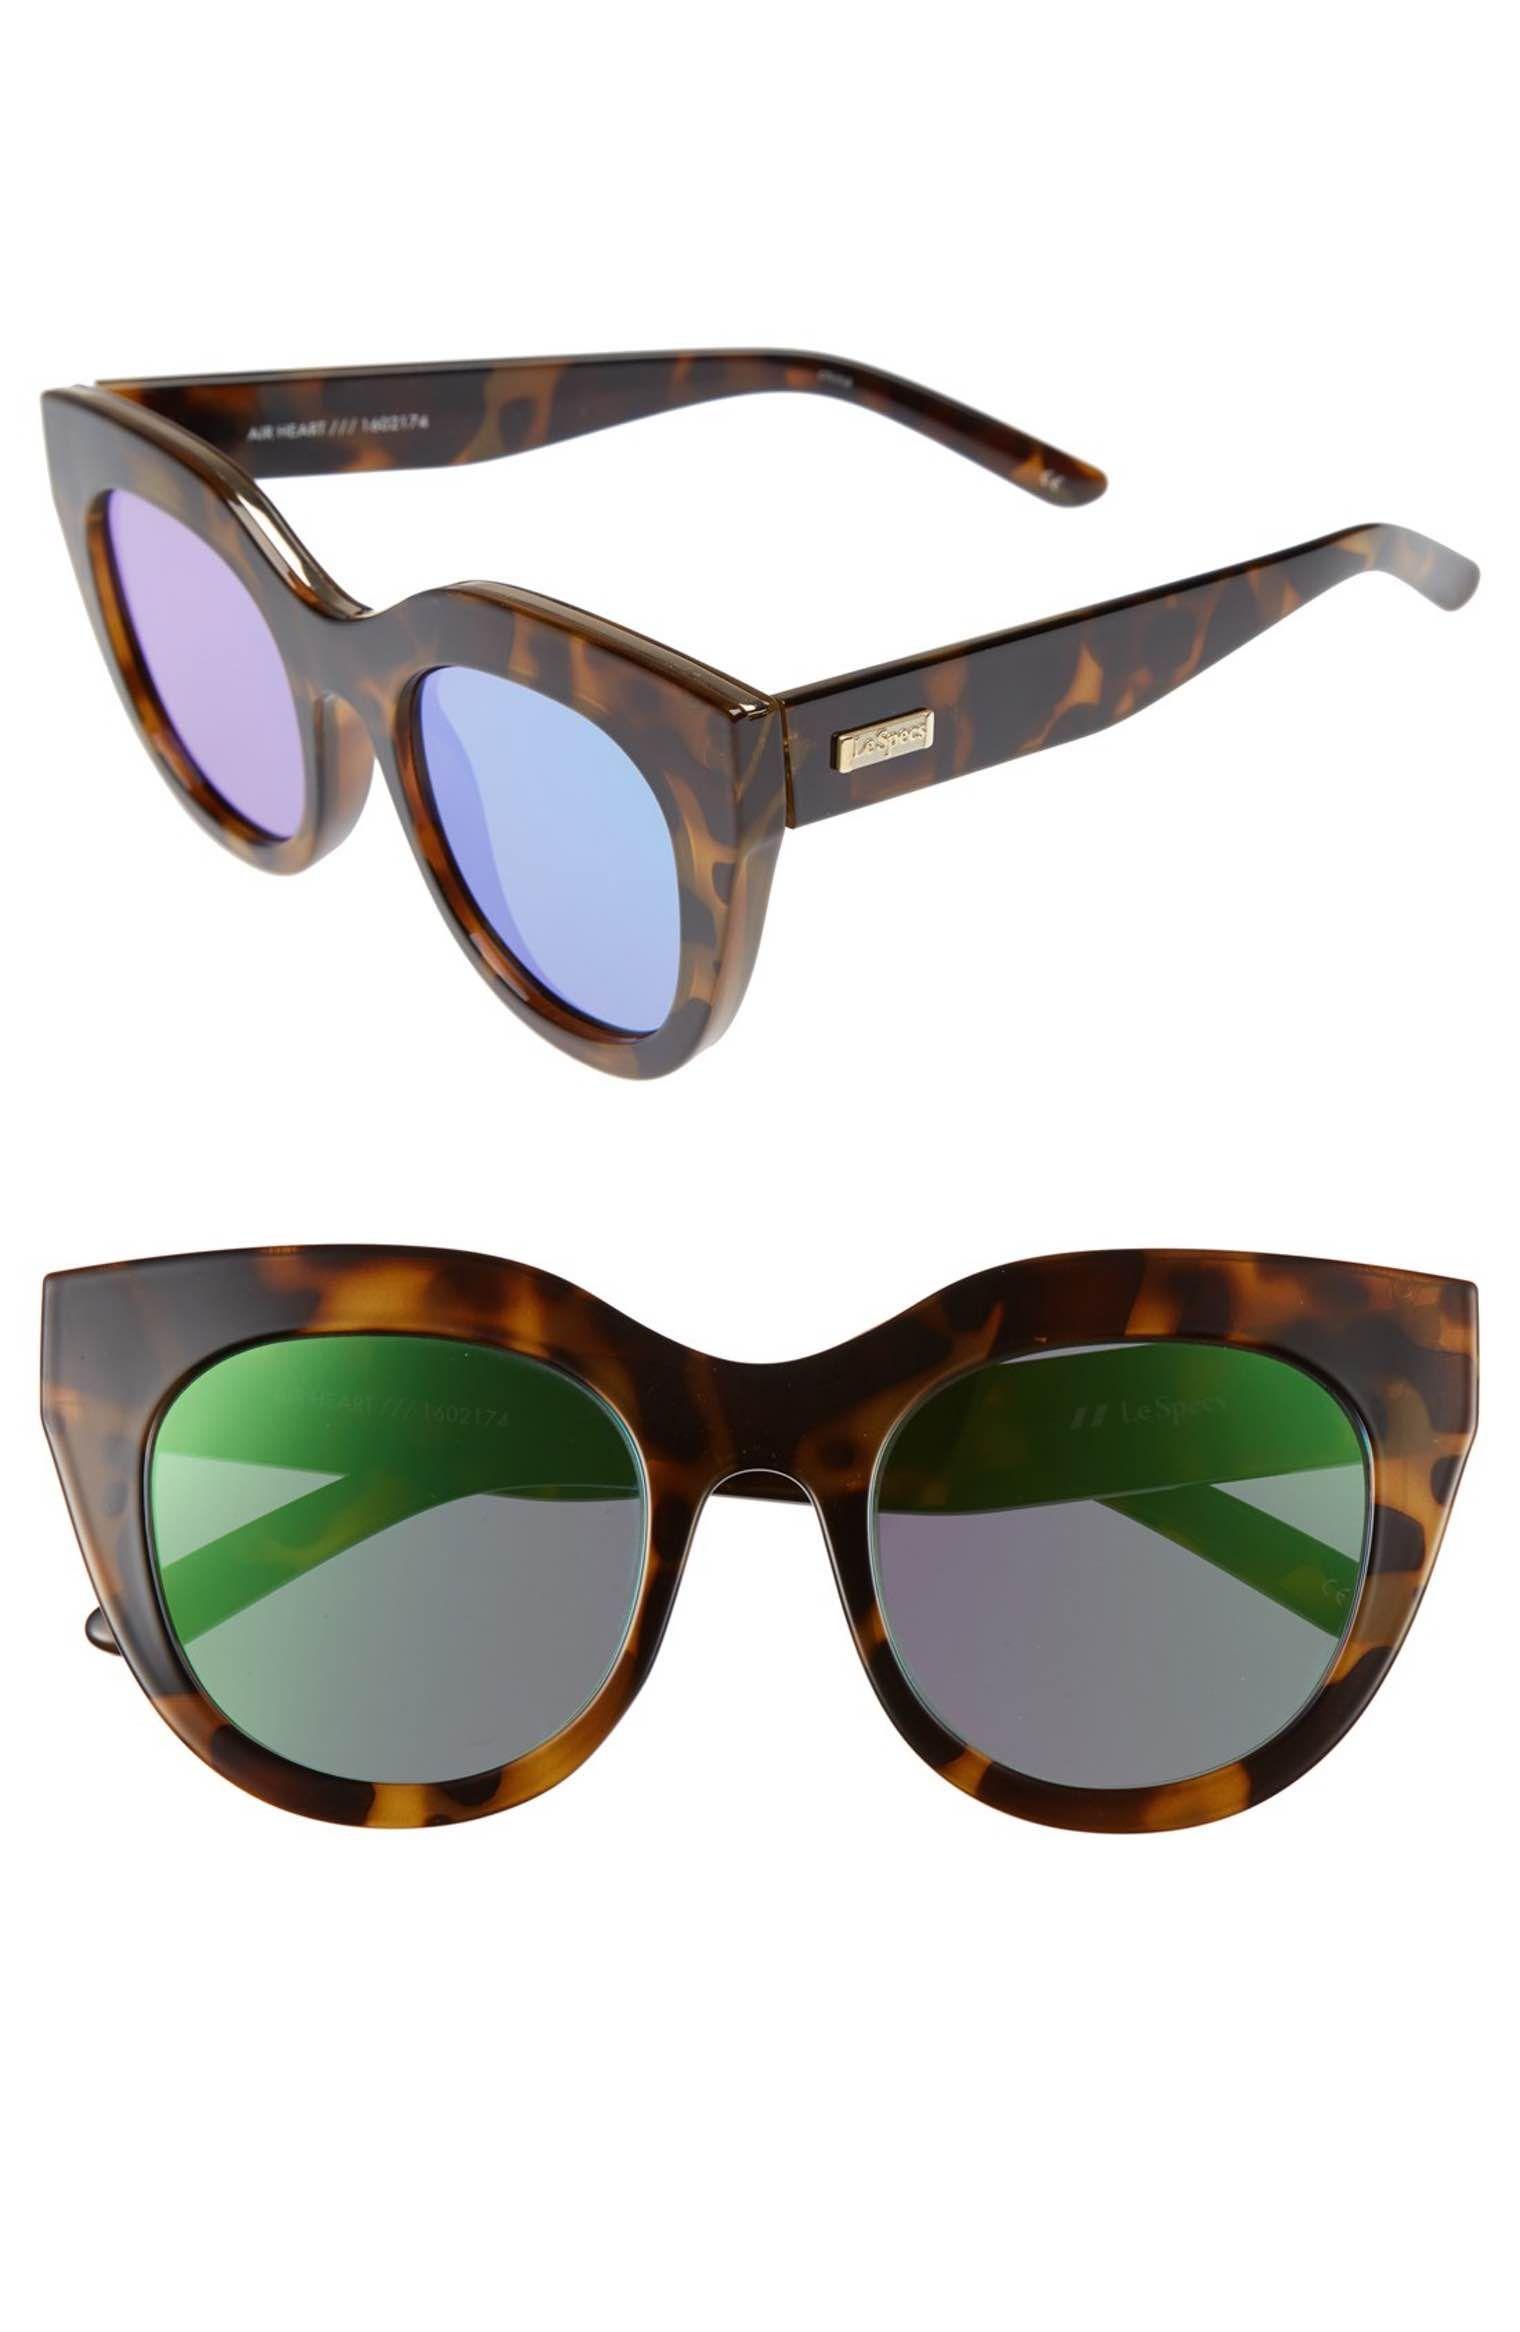 86c2b3d97d9cd Main Image - Le Specs Air Heart 51mm Sunglasses